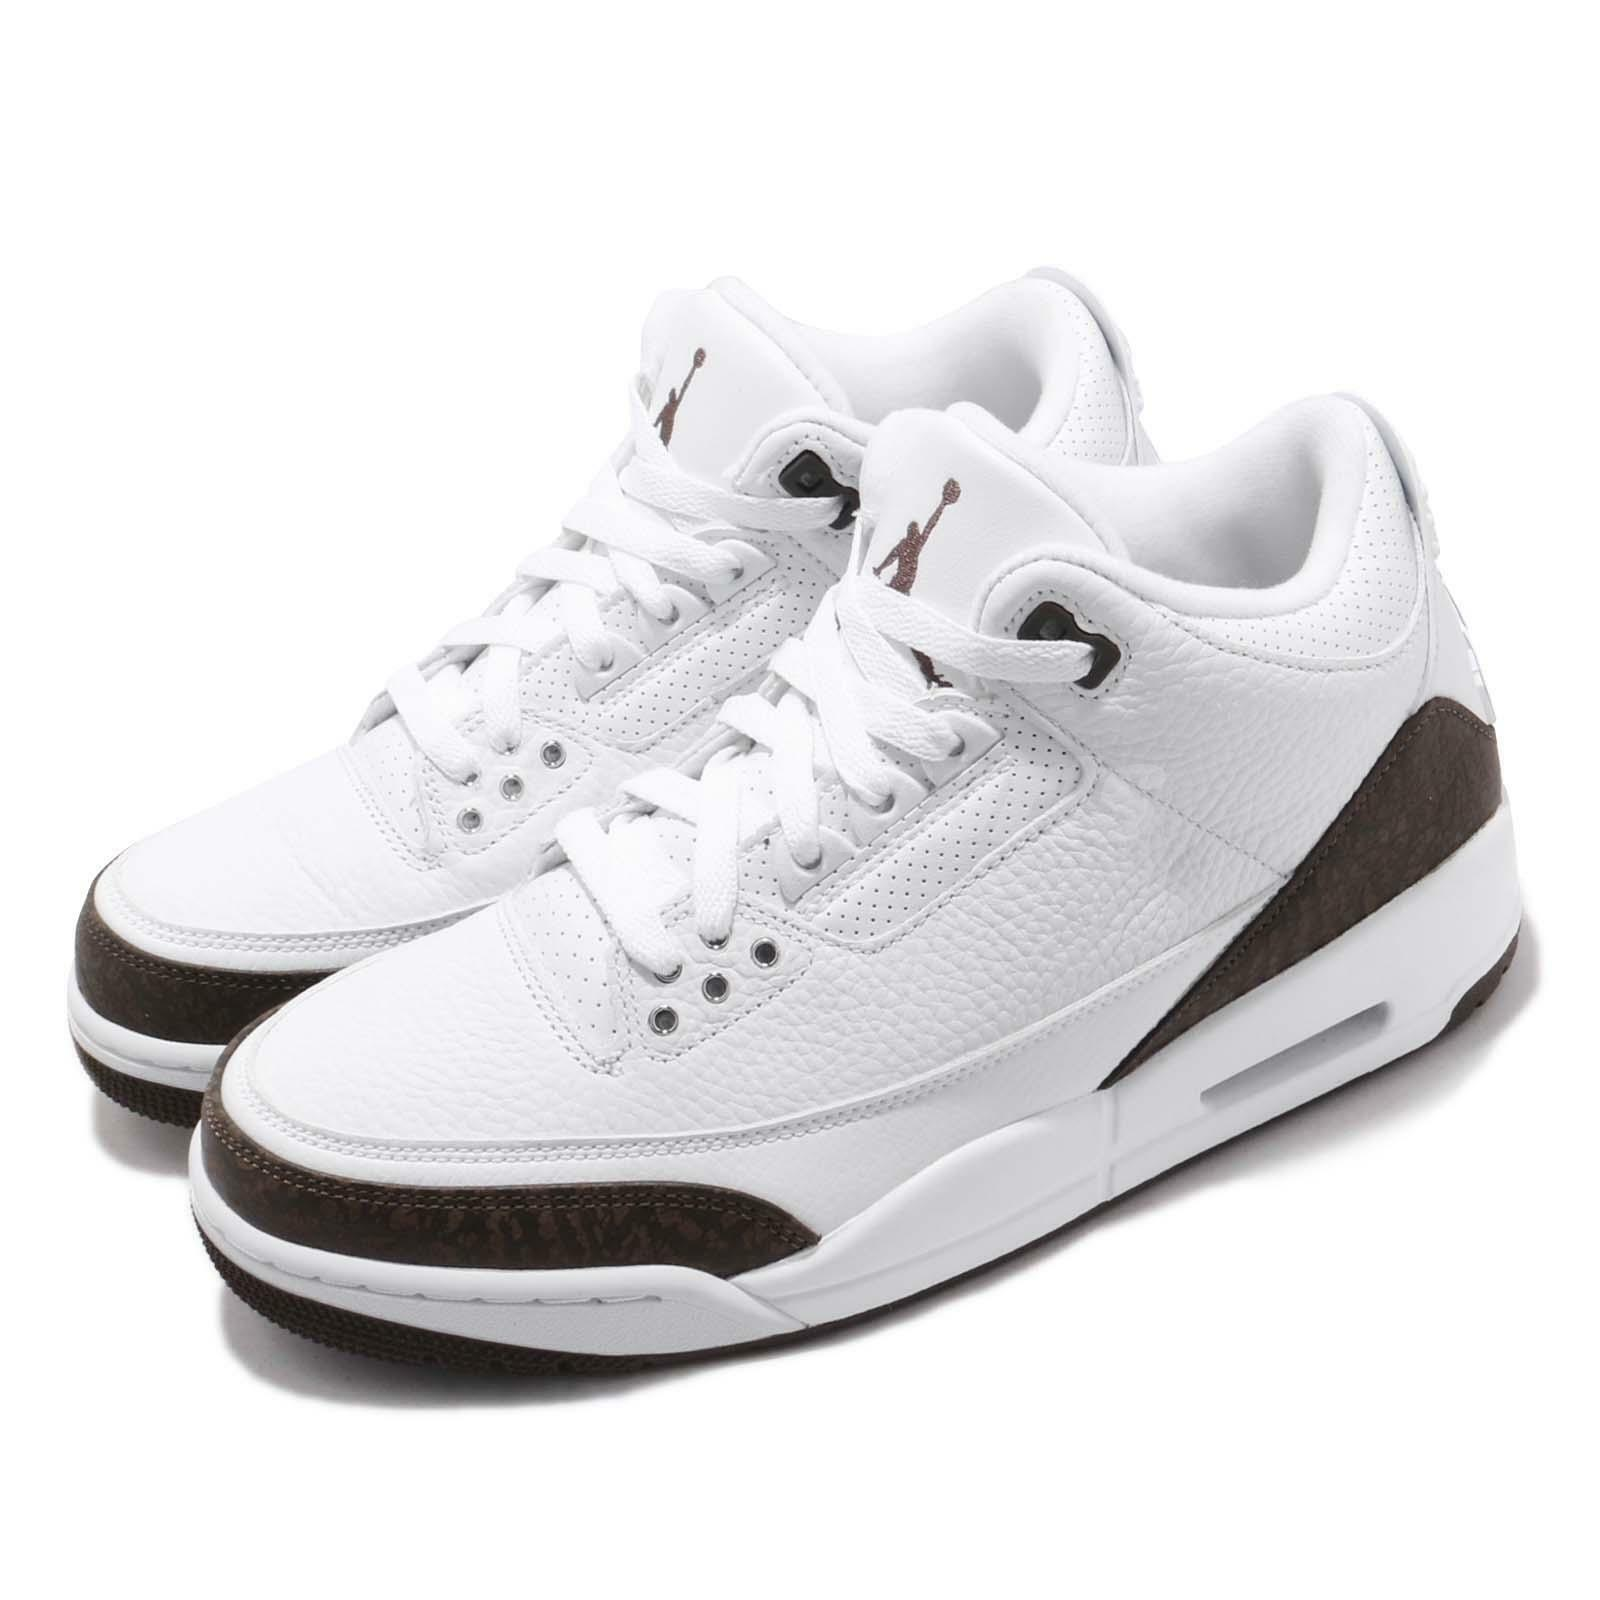 Nike Air Jordan 3 Retro Mocha 2018 III AJ3 White Men Basketball shoes 136064-122